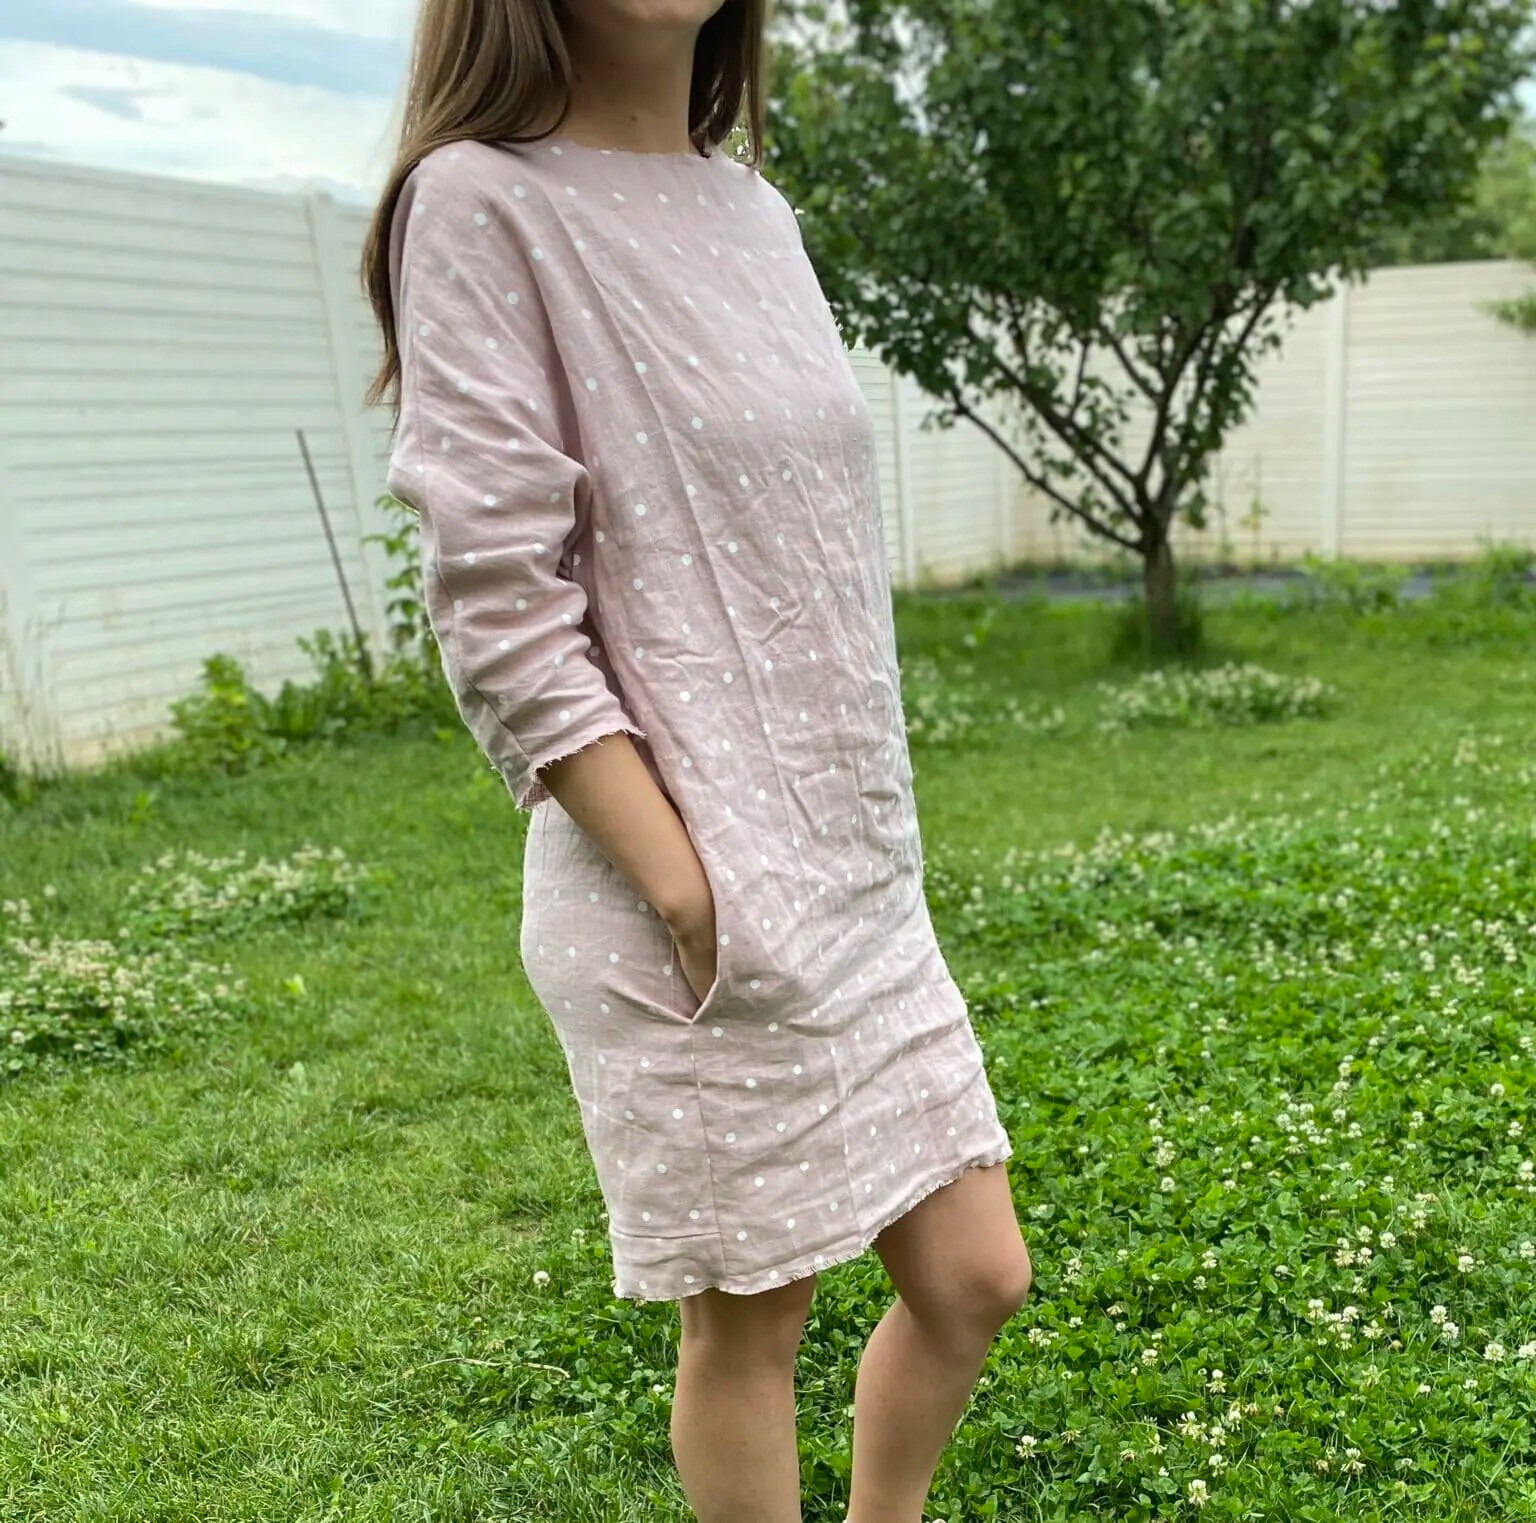 Linen Tunic Dress - DIY Sewing Tutorial